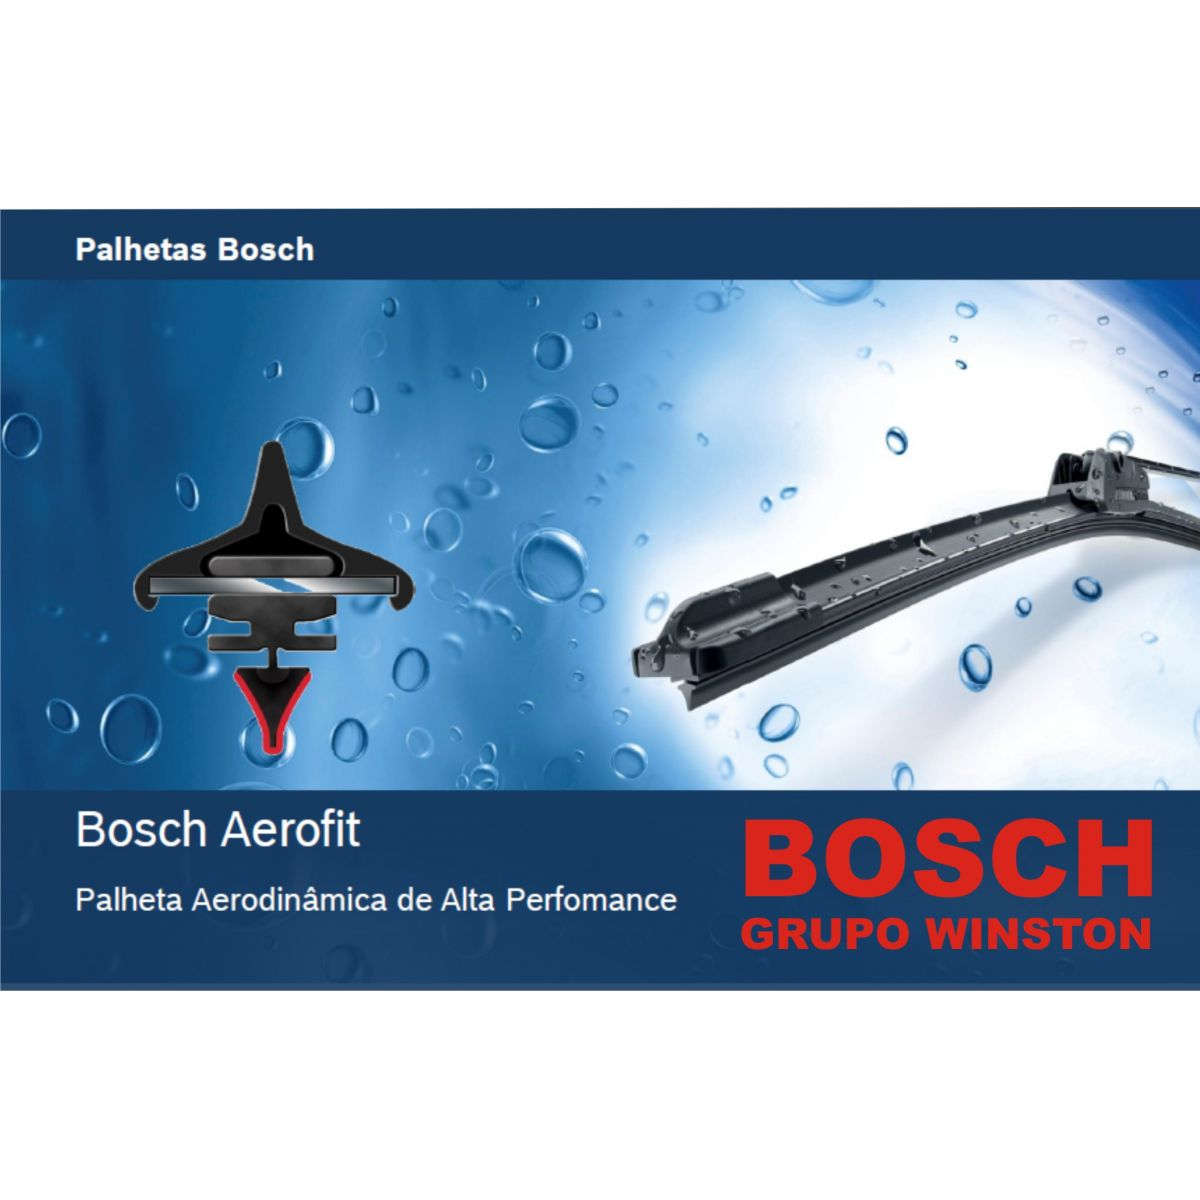 Palheta Bosch Aerofit Limpador de para brisa Bosch AUDI A3 S3